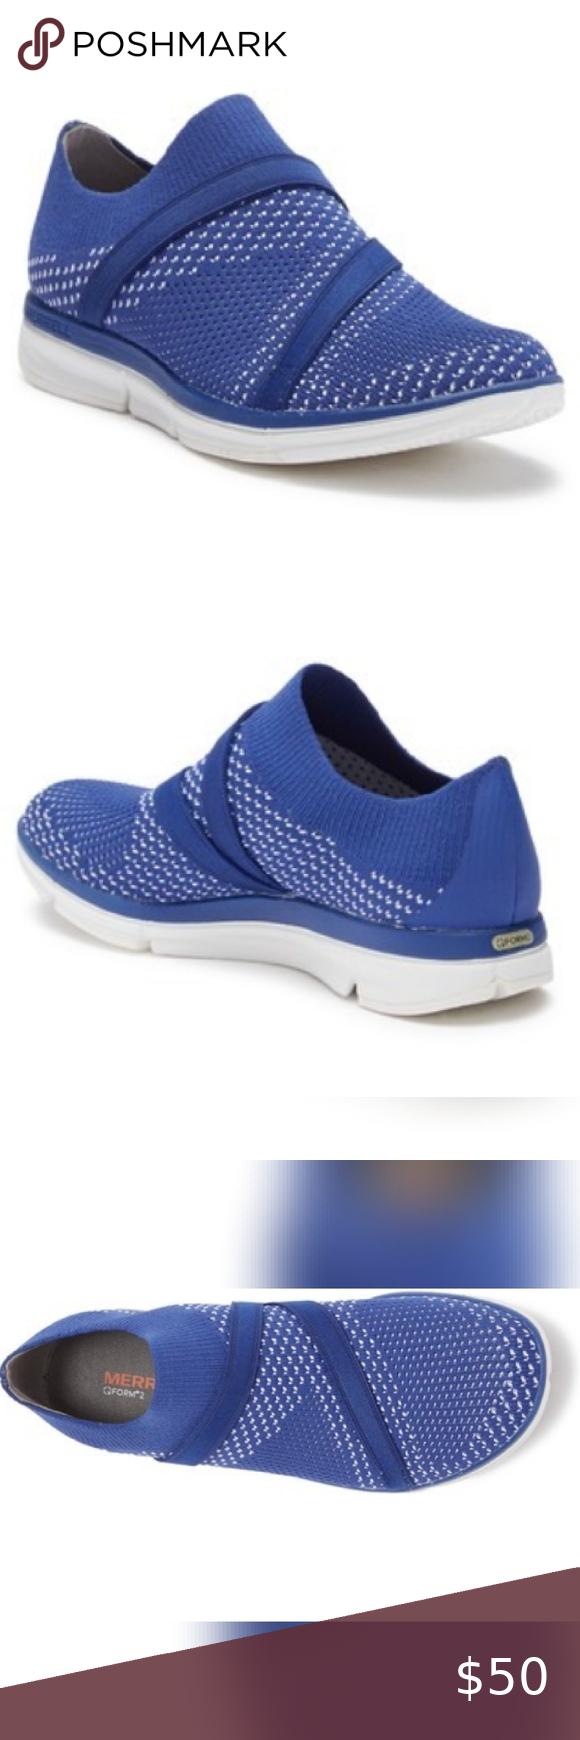 Nwot Merrell Zoe Sojourn Knit Sneaker In 2020 Sneakers Knit Sneakers Womens Shoes Sneakers